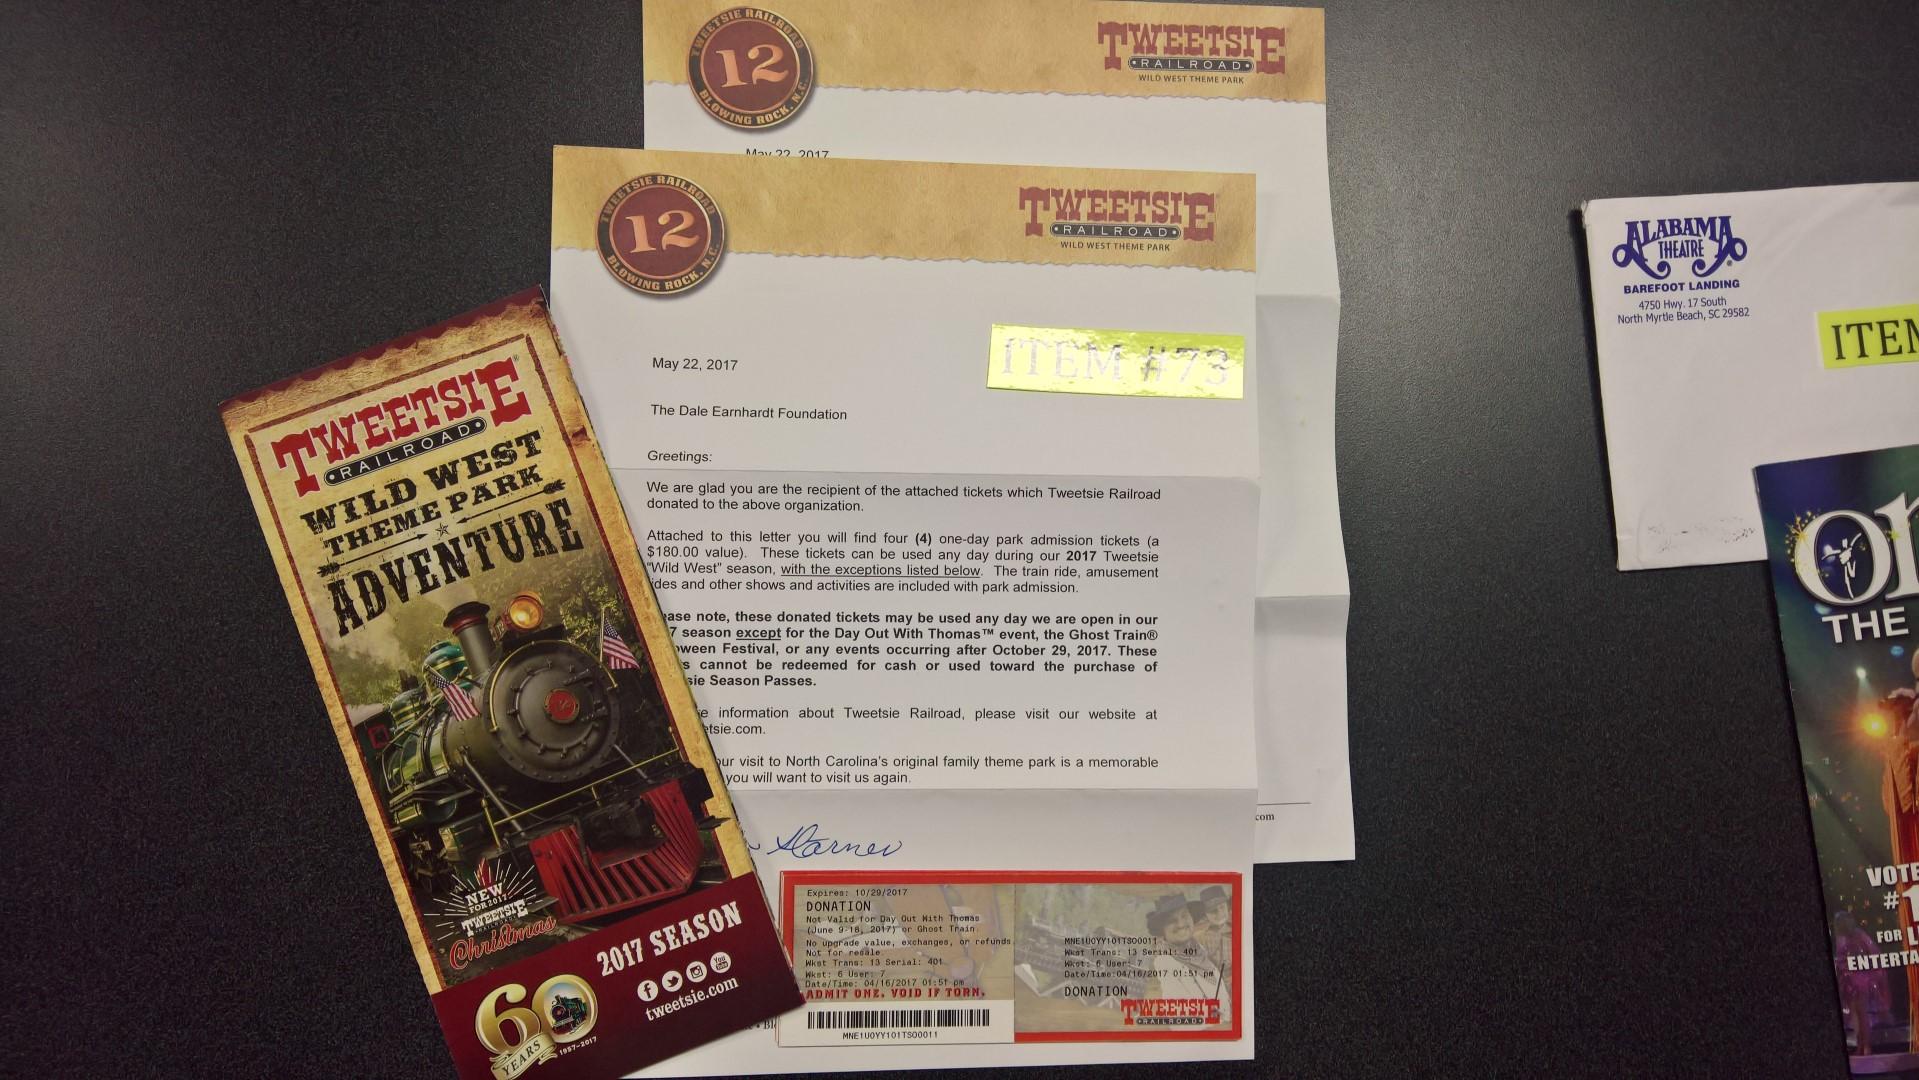 4 Tickets to Tweetsie Railroad in Blowing Rock, NC